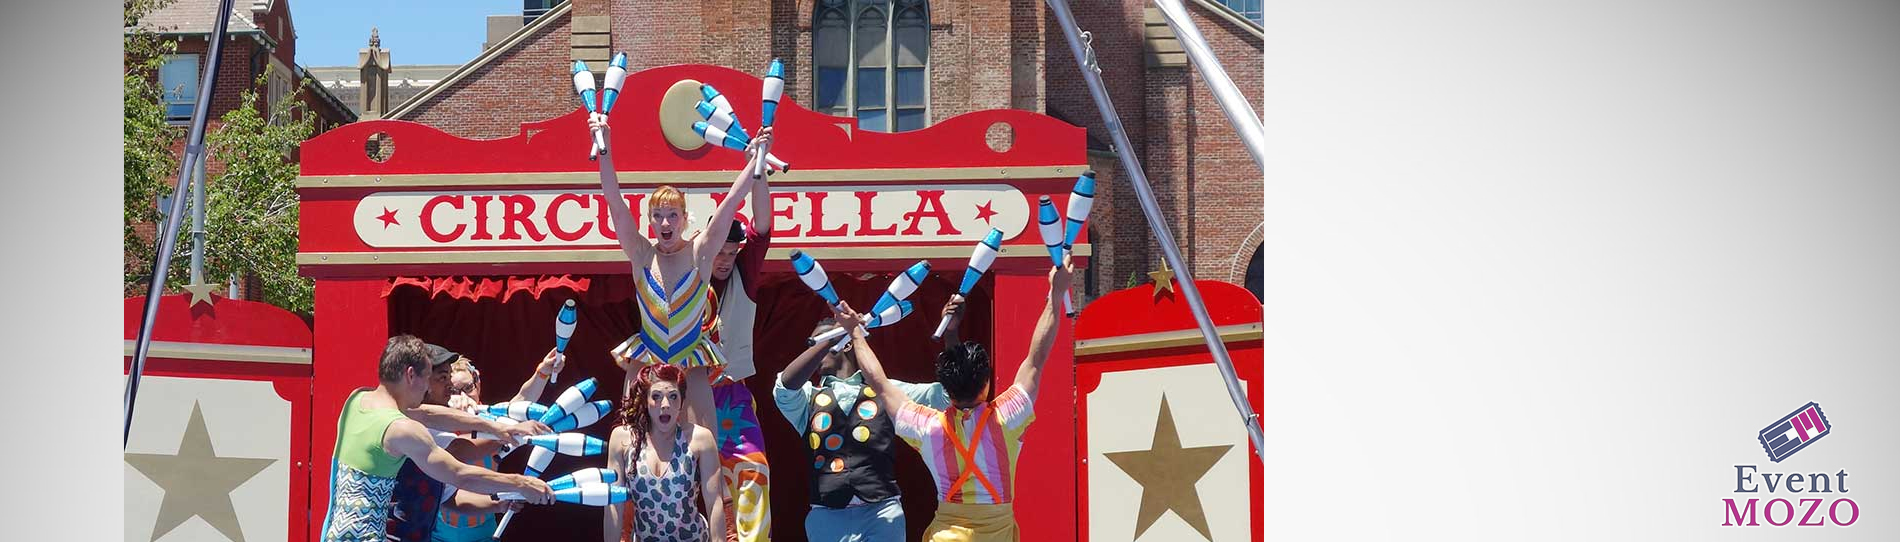 EventMozo Free Summer Circus Day with Circus Bella